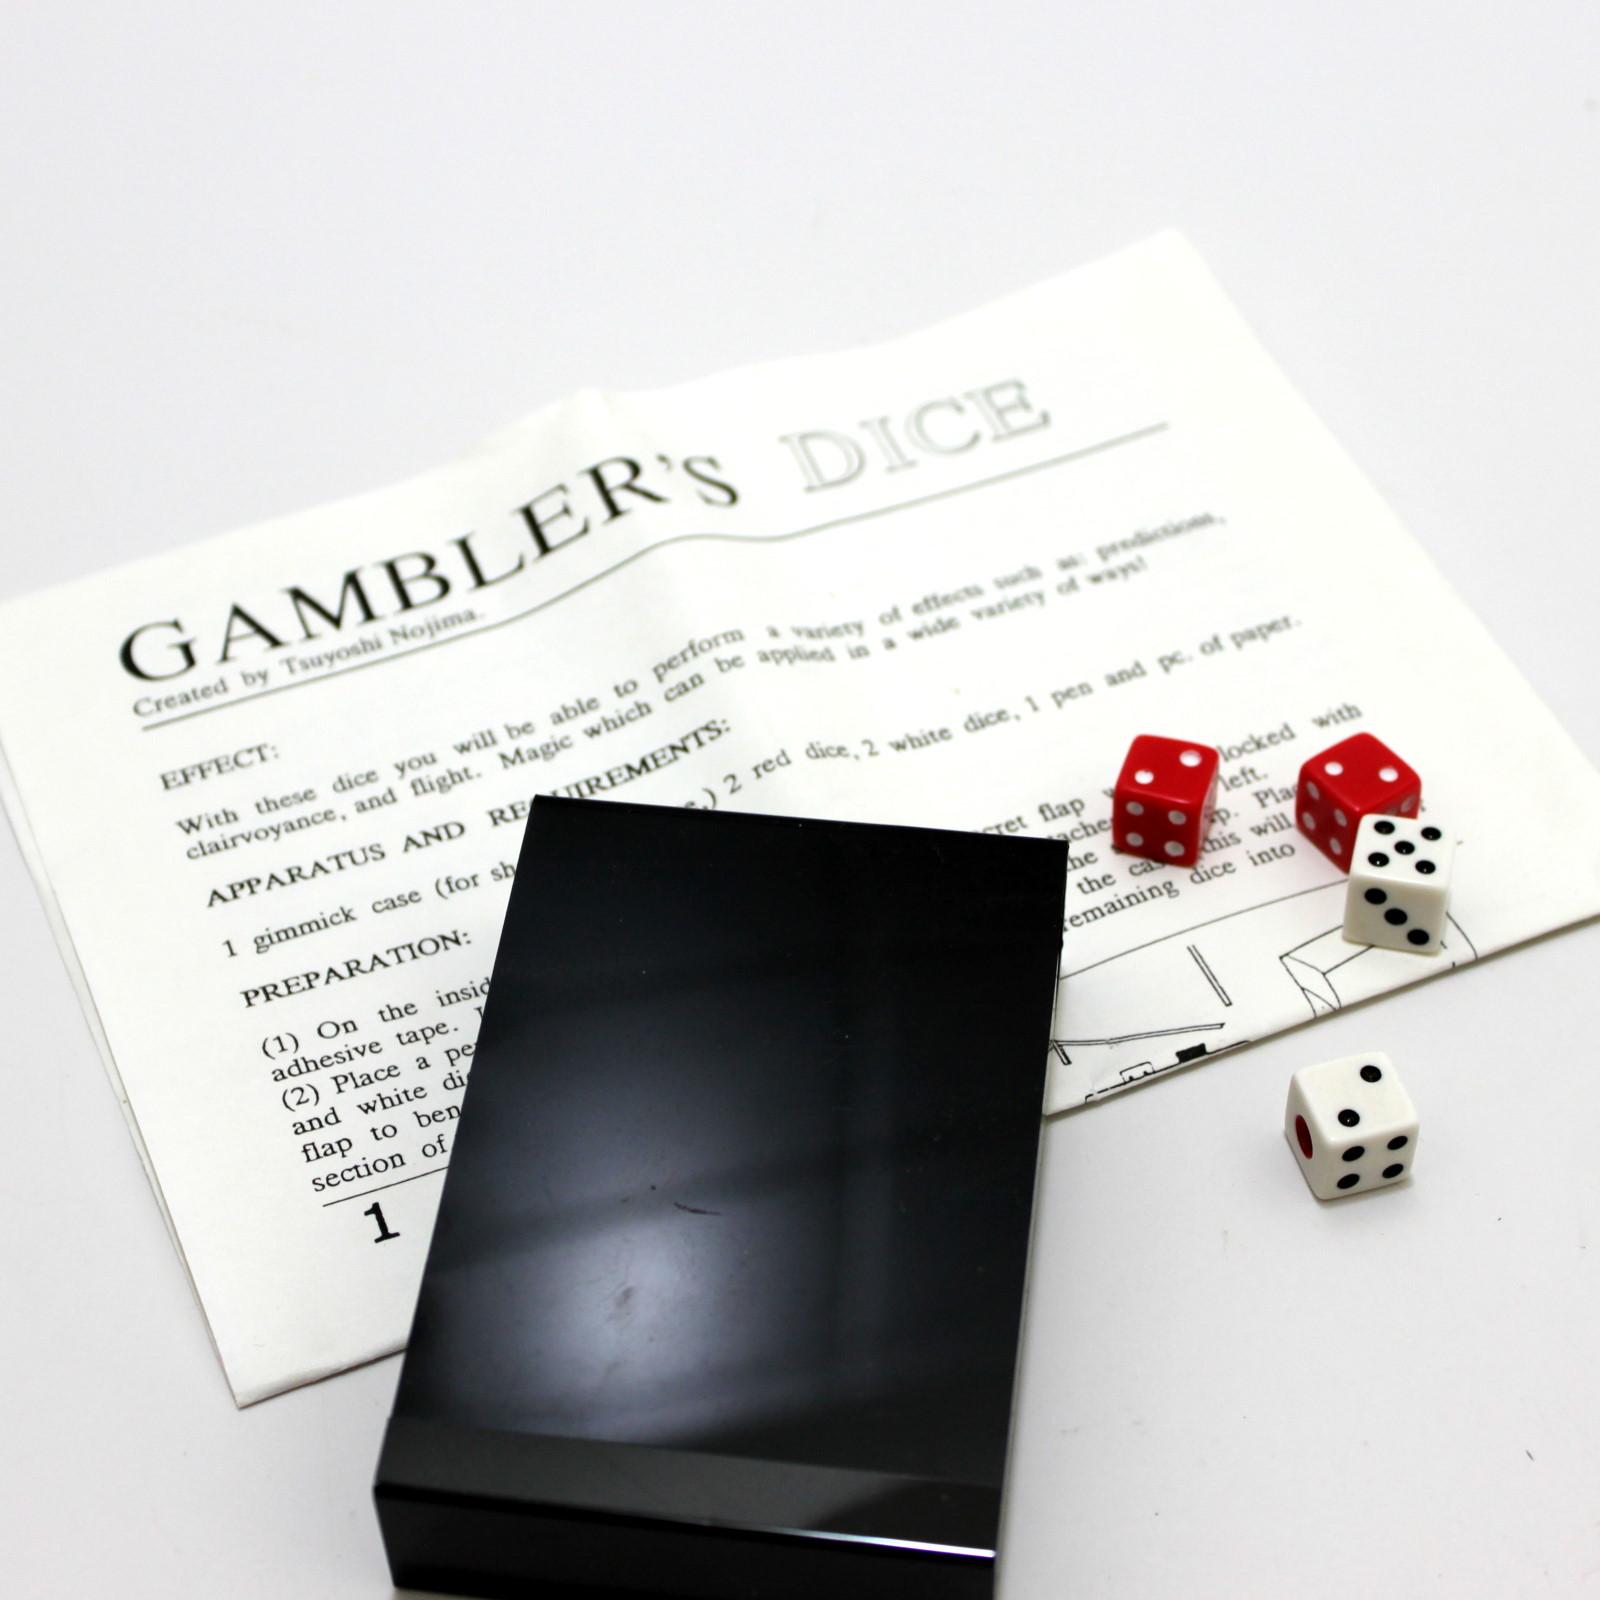 Gambler's Dice by Tricks Co.